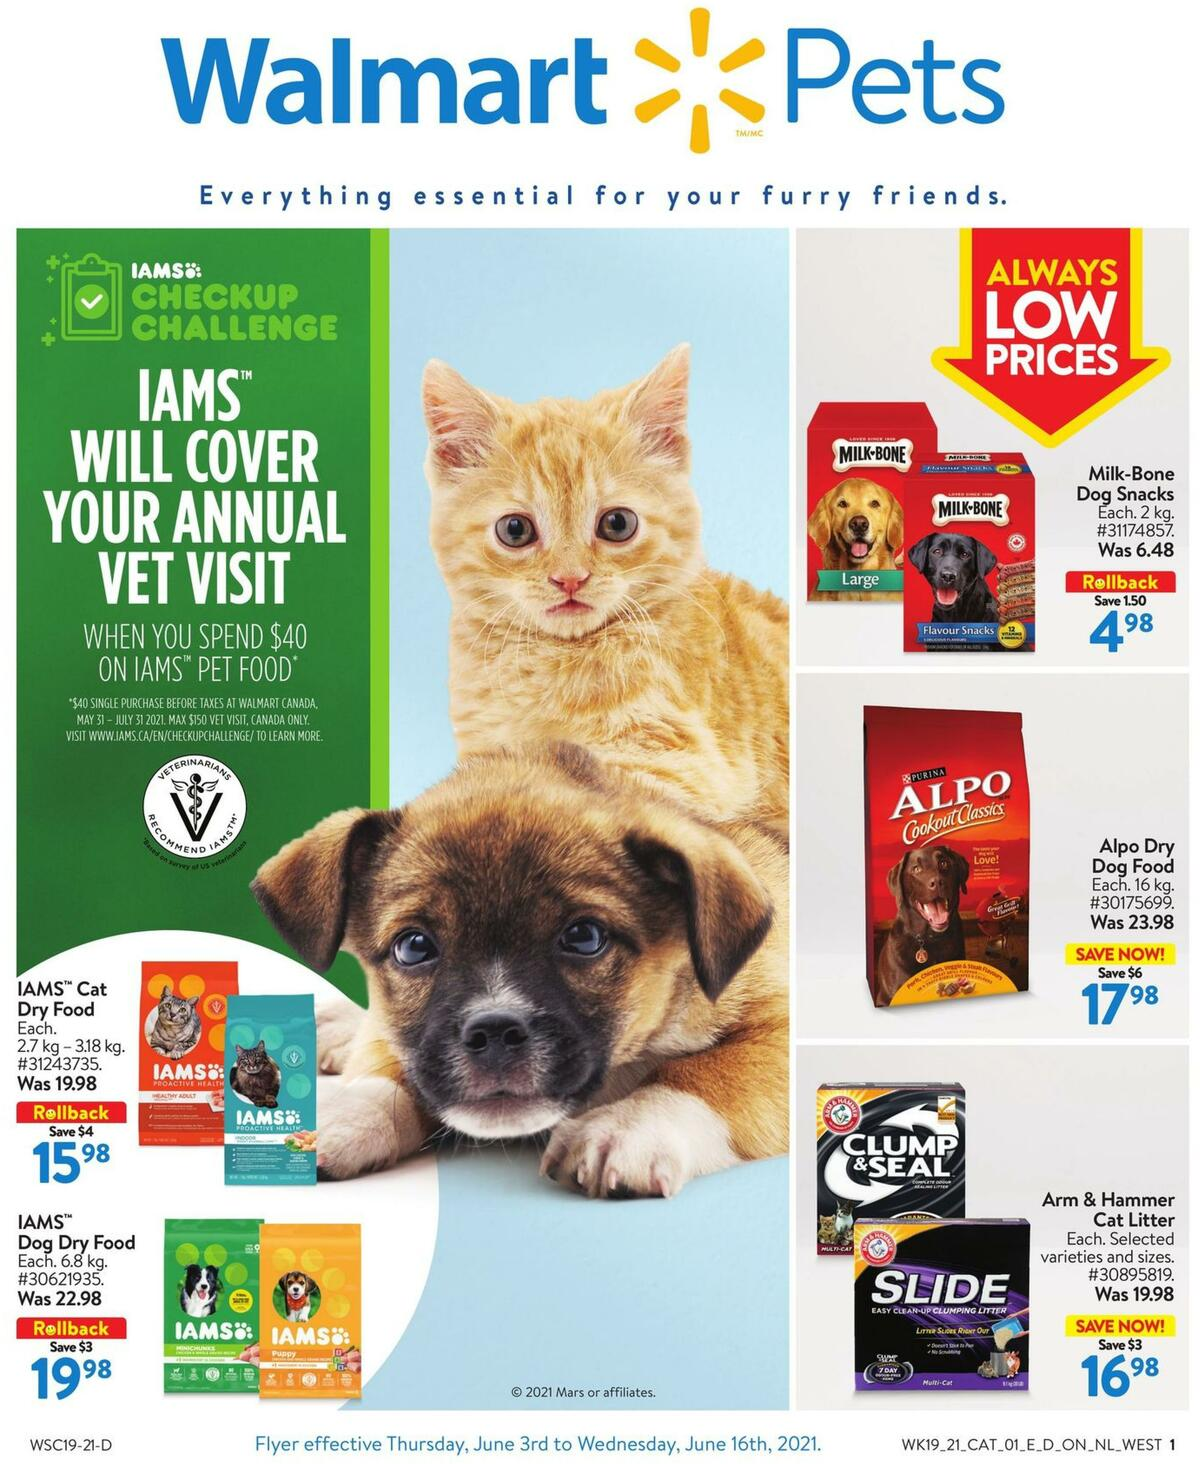 Walmart Pets Flyer from June 3